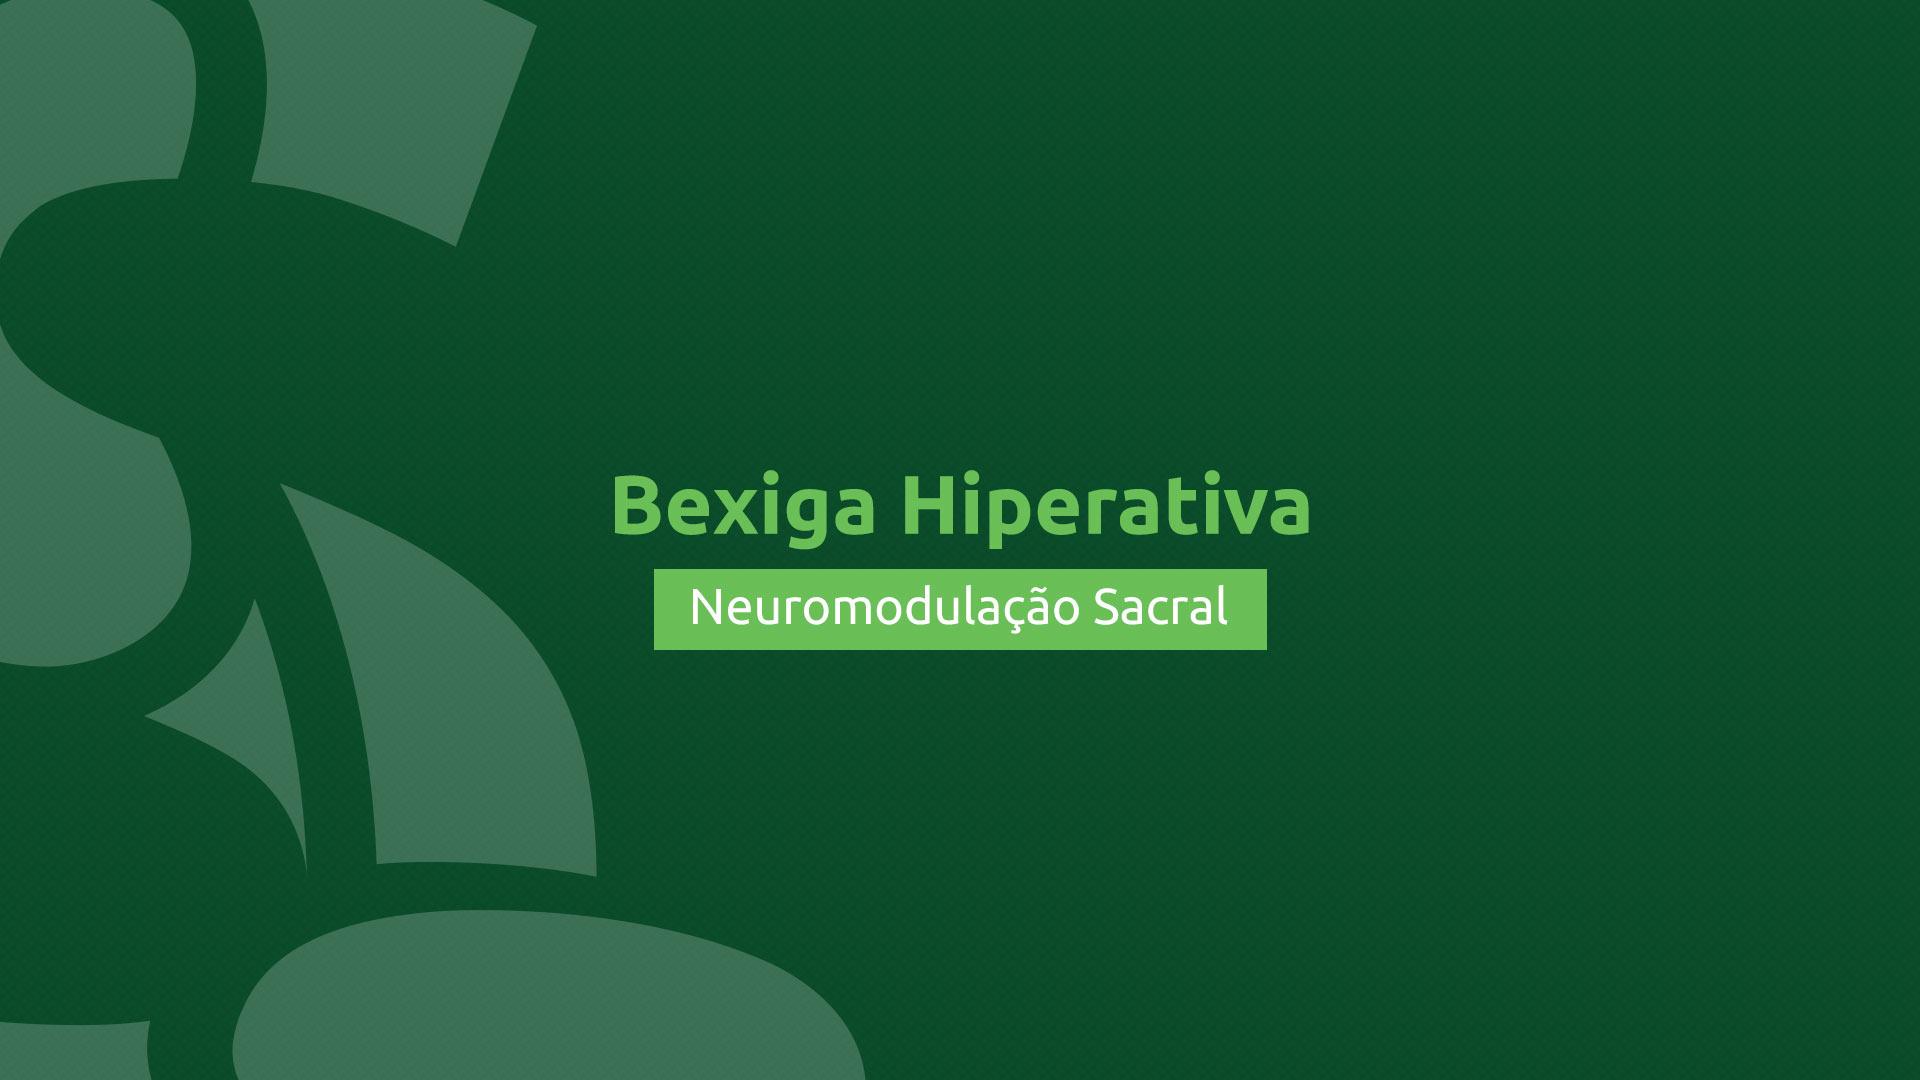 Bexiga Hiperativa